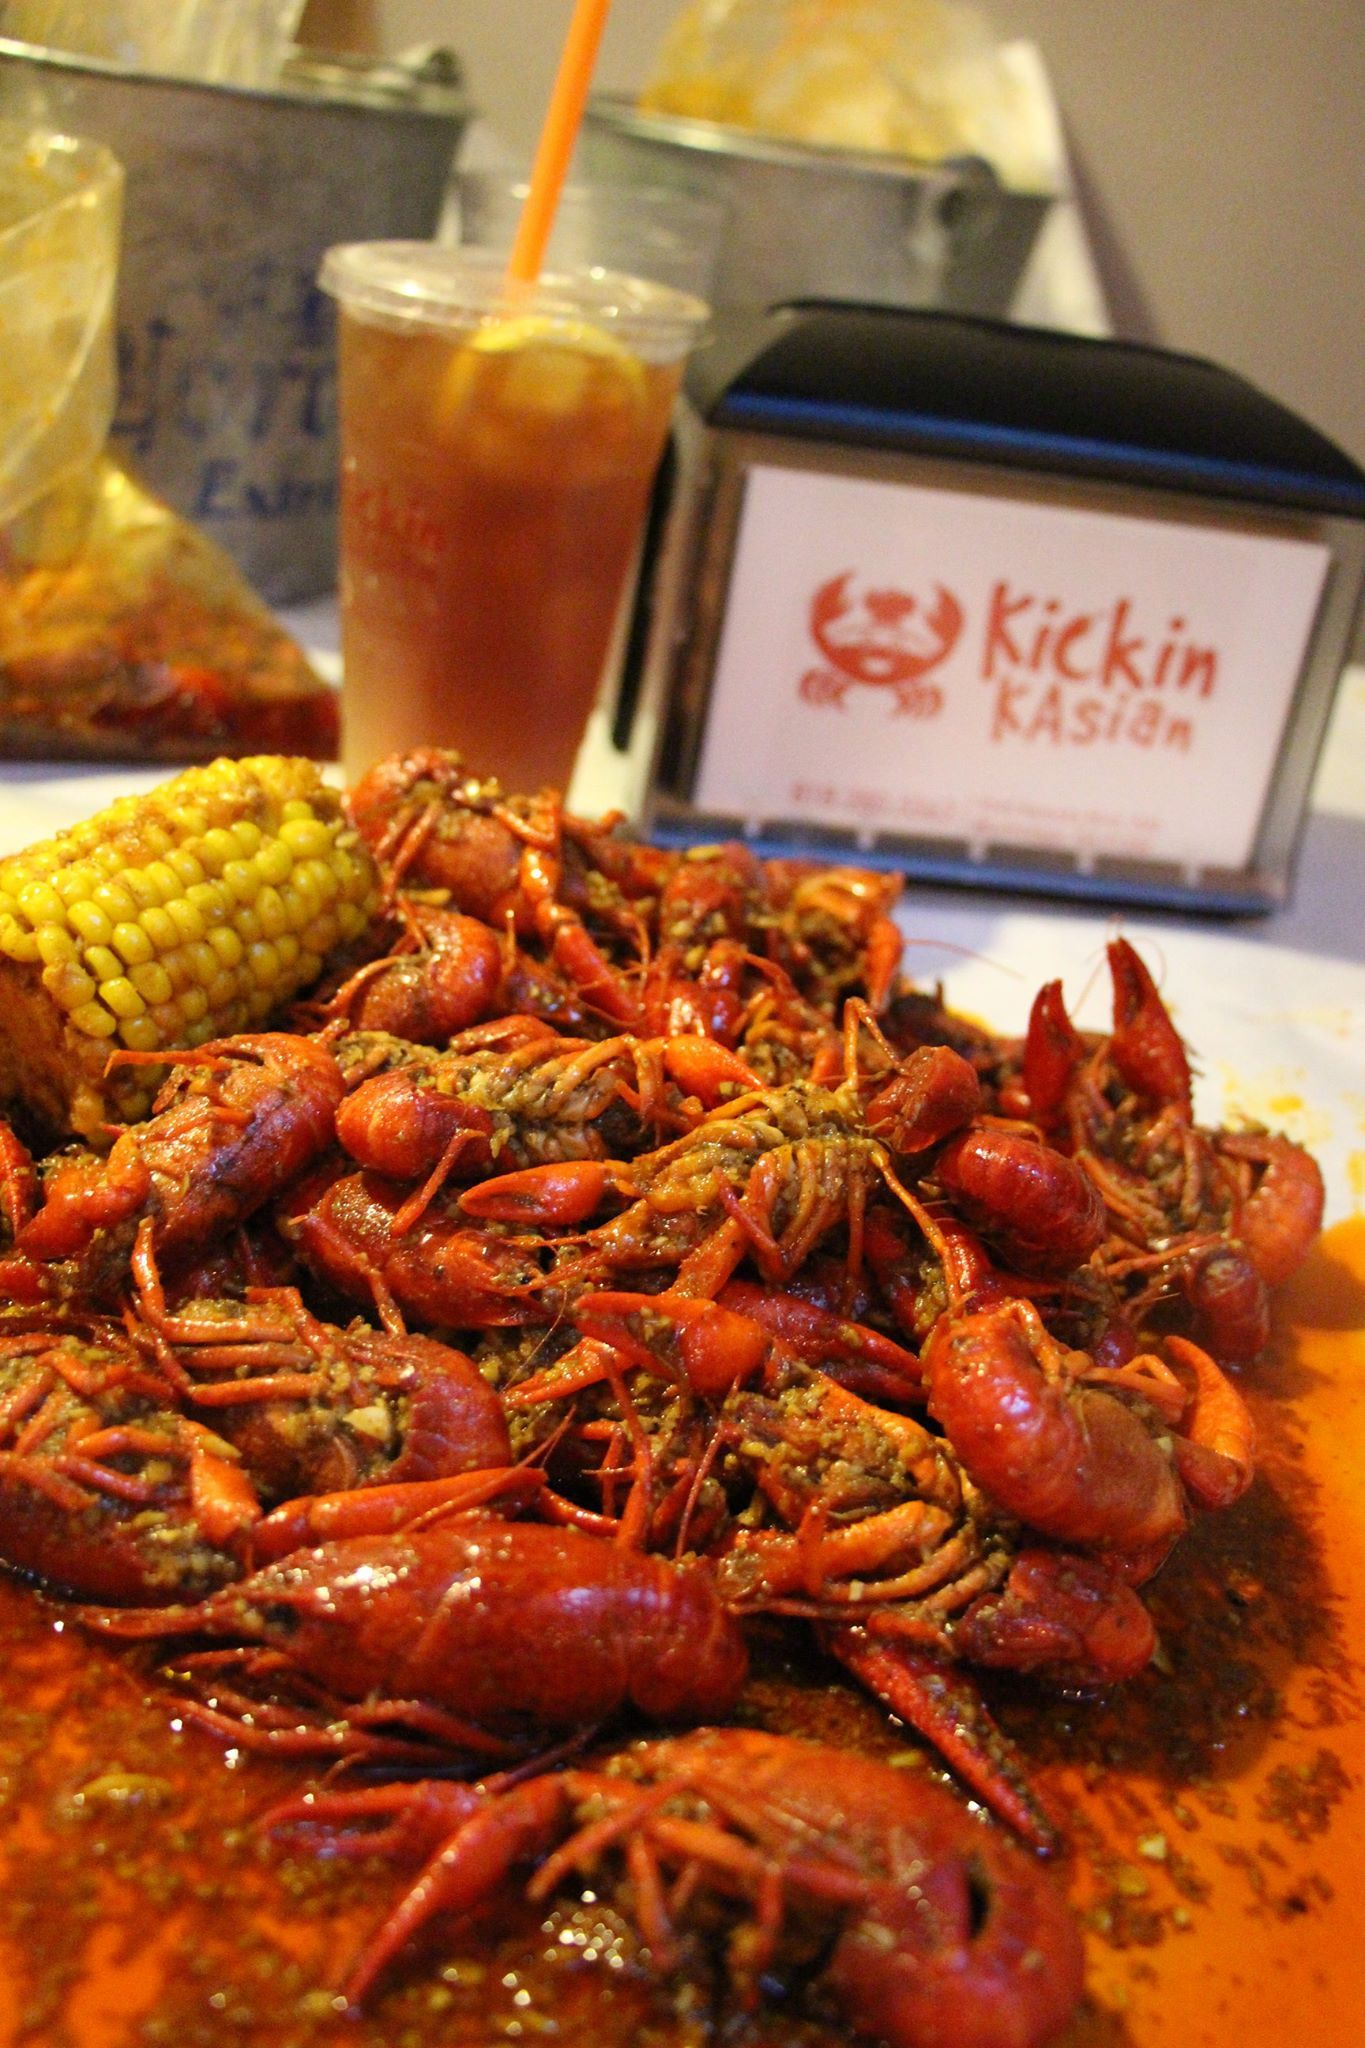 Northridge Ca Review Of Kickin Kasian Northridge Cooking Network Seafood